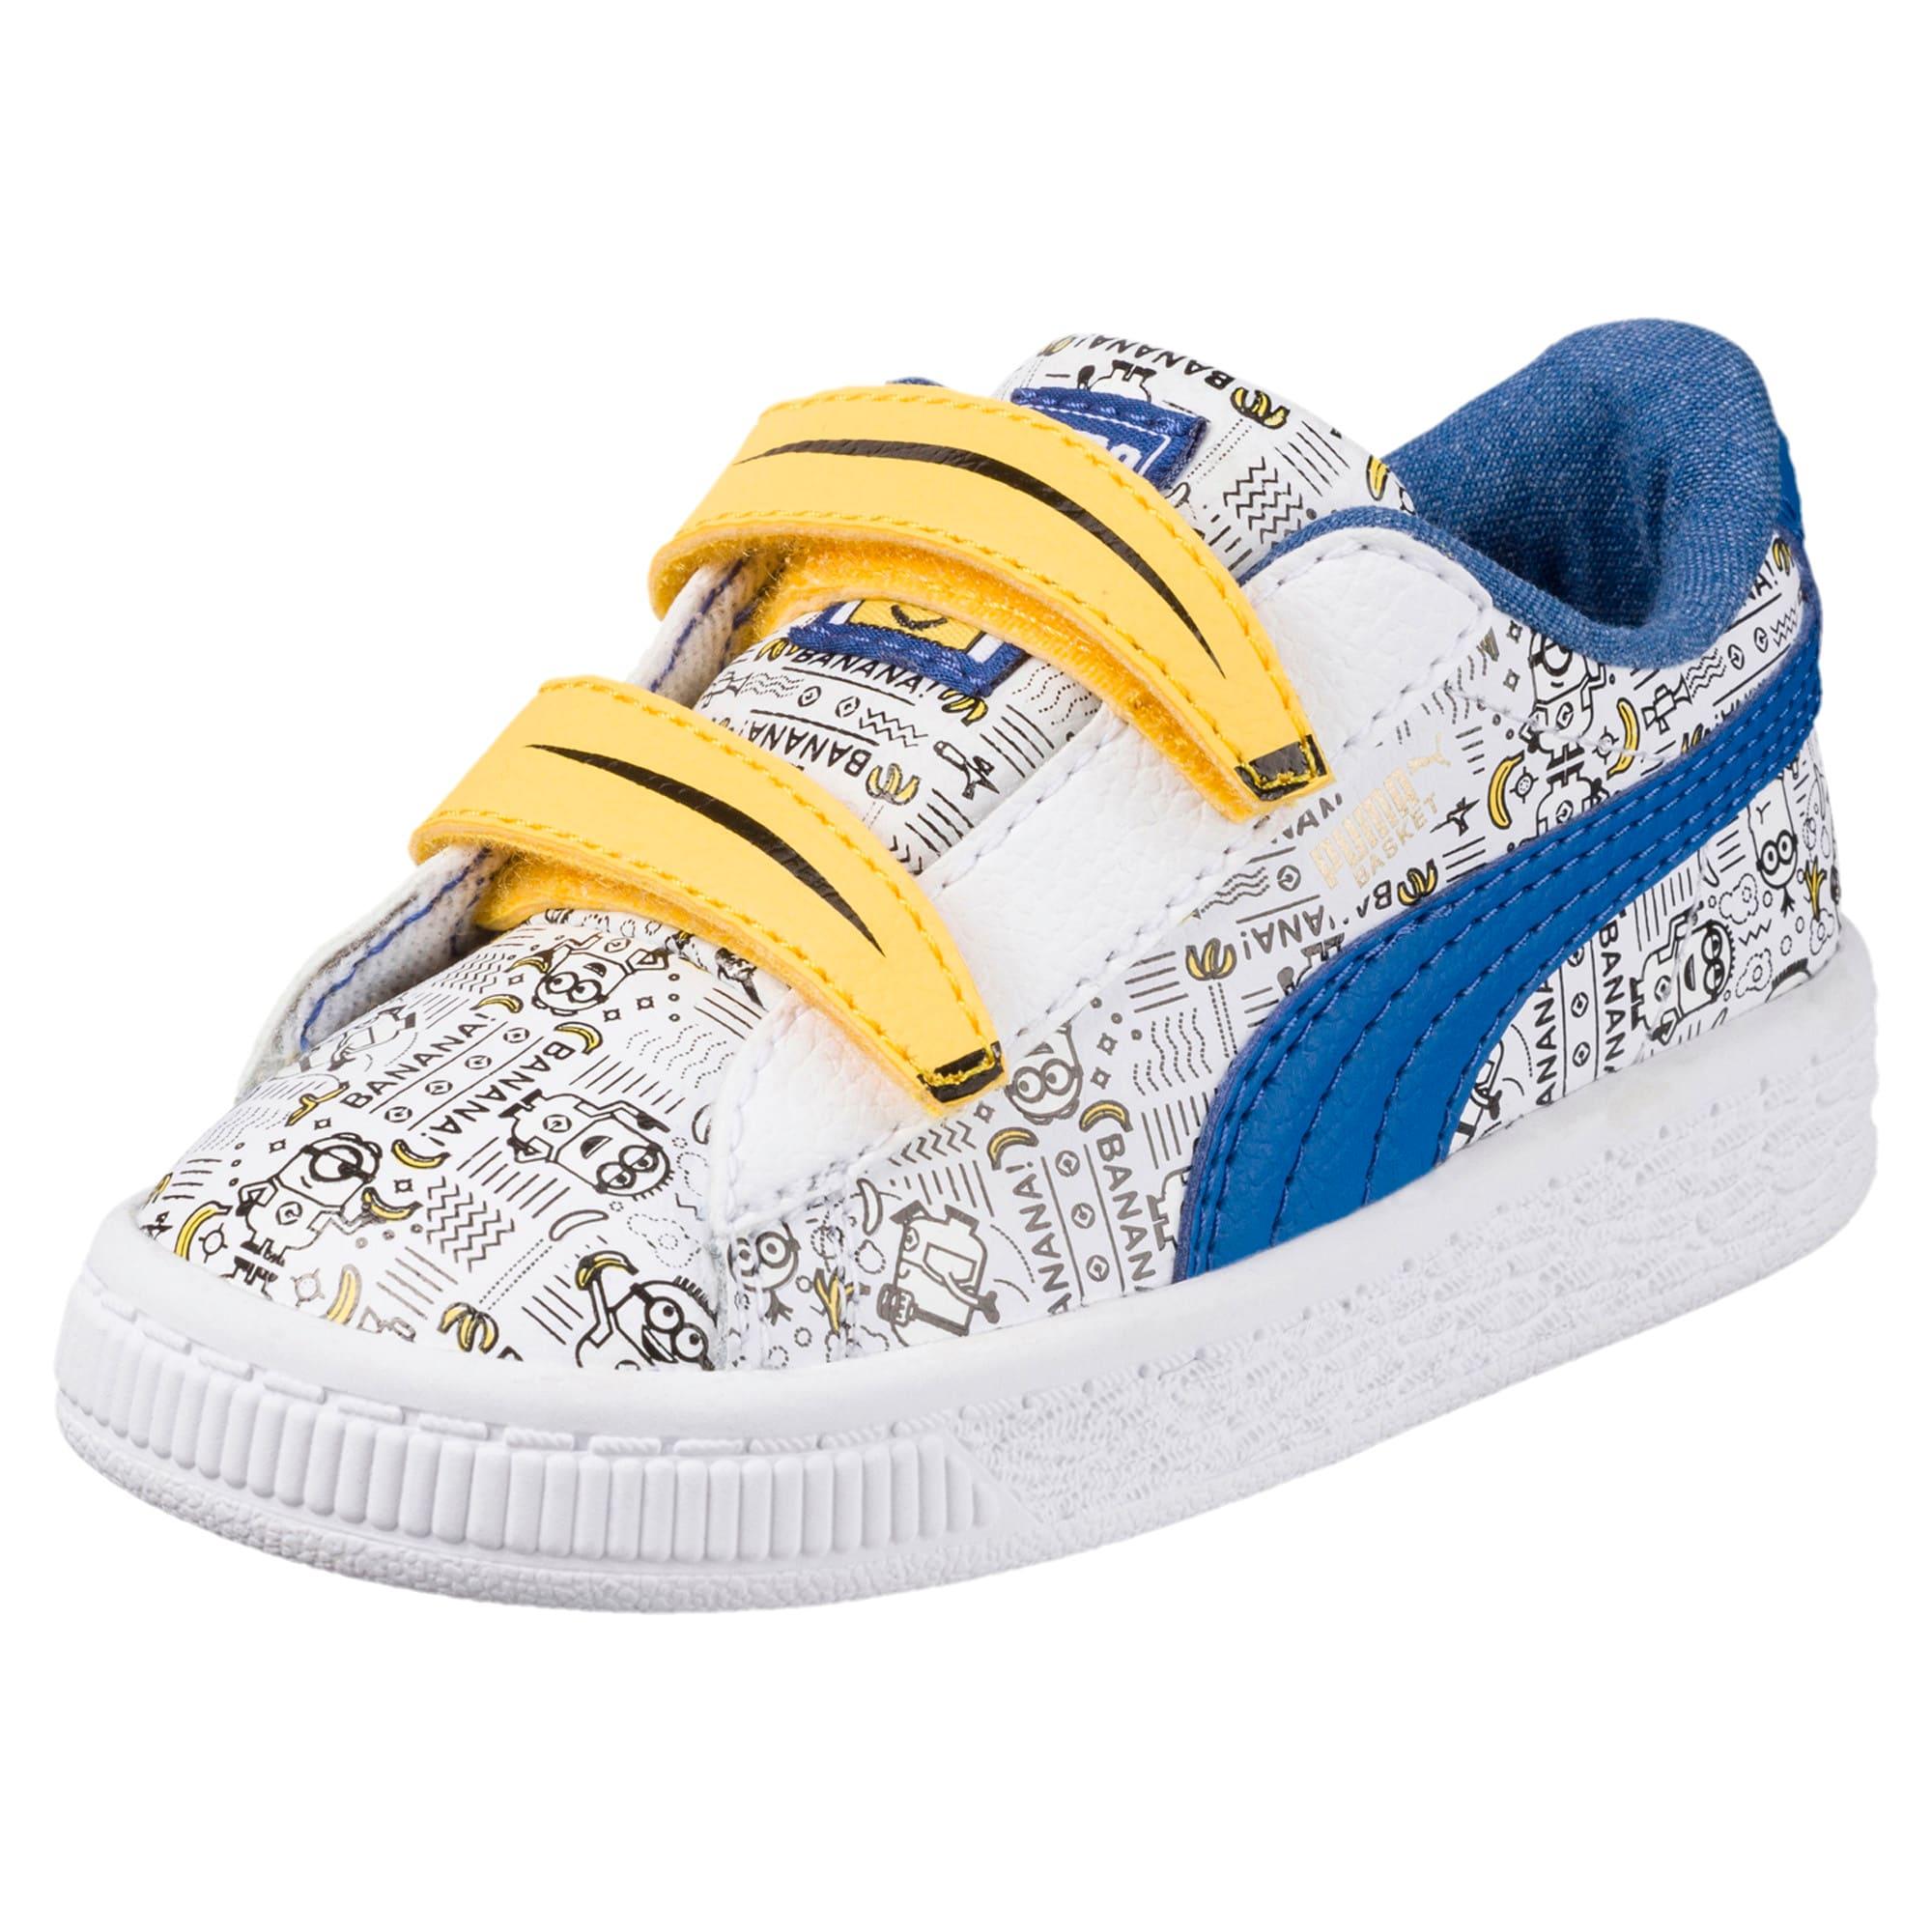 Thumbnail 1 of Minions Basket Little Kids' Shoes, Puma White-Lapis Blue, medium